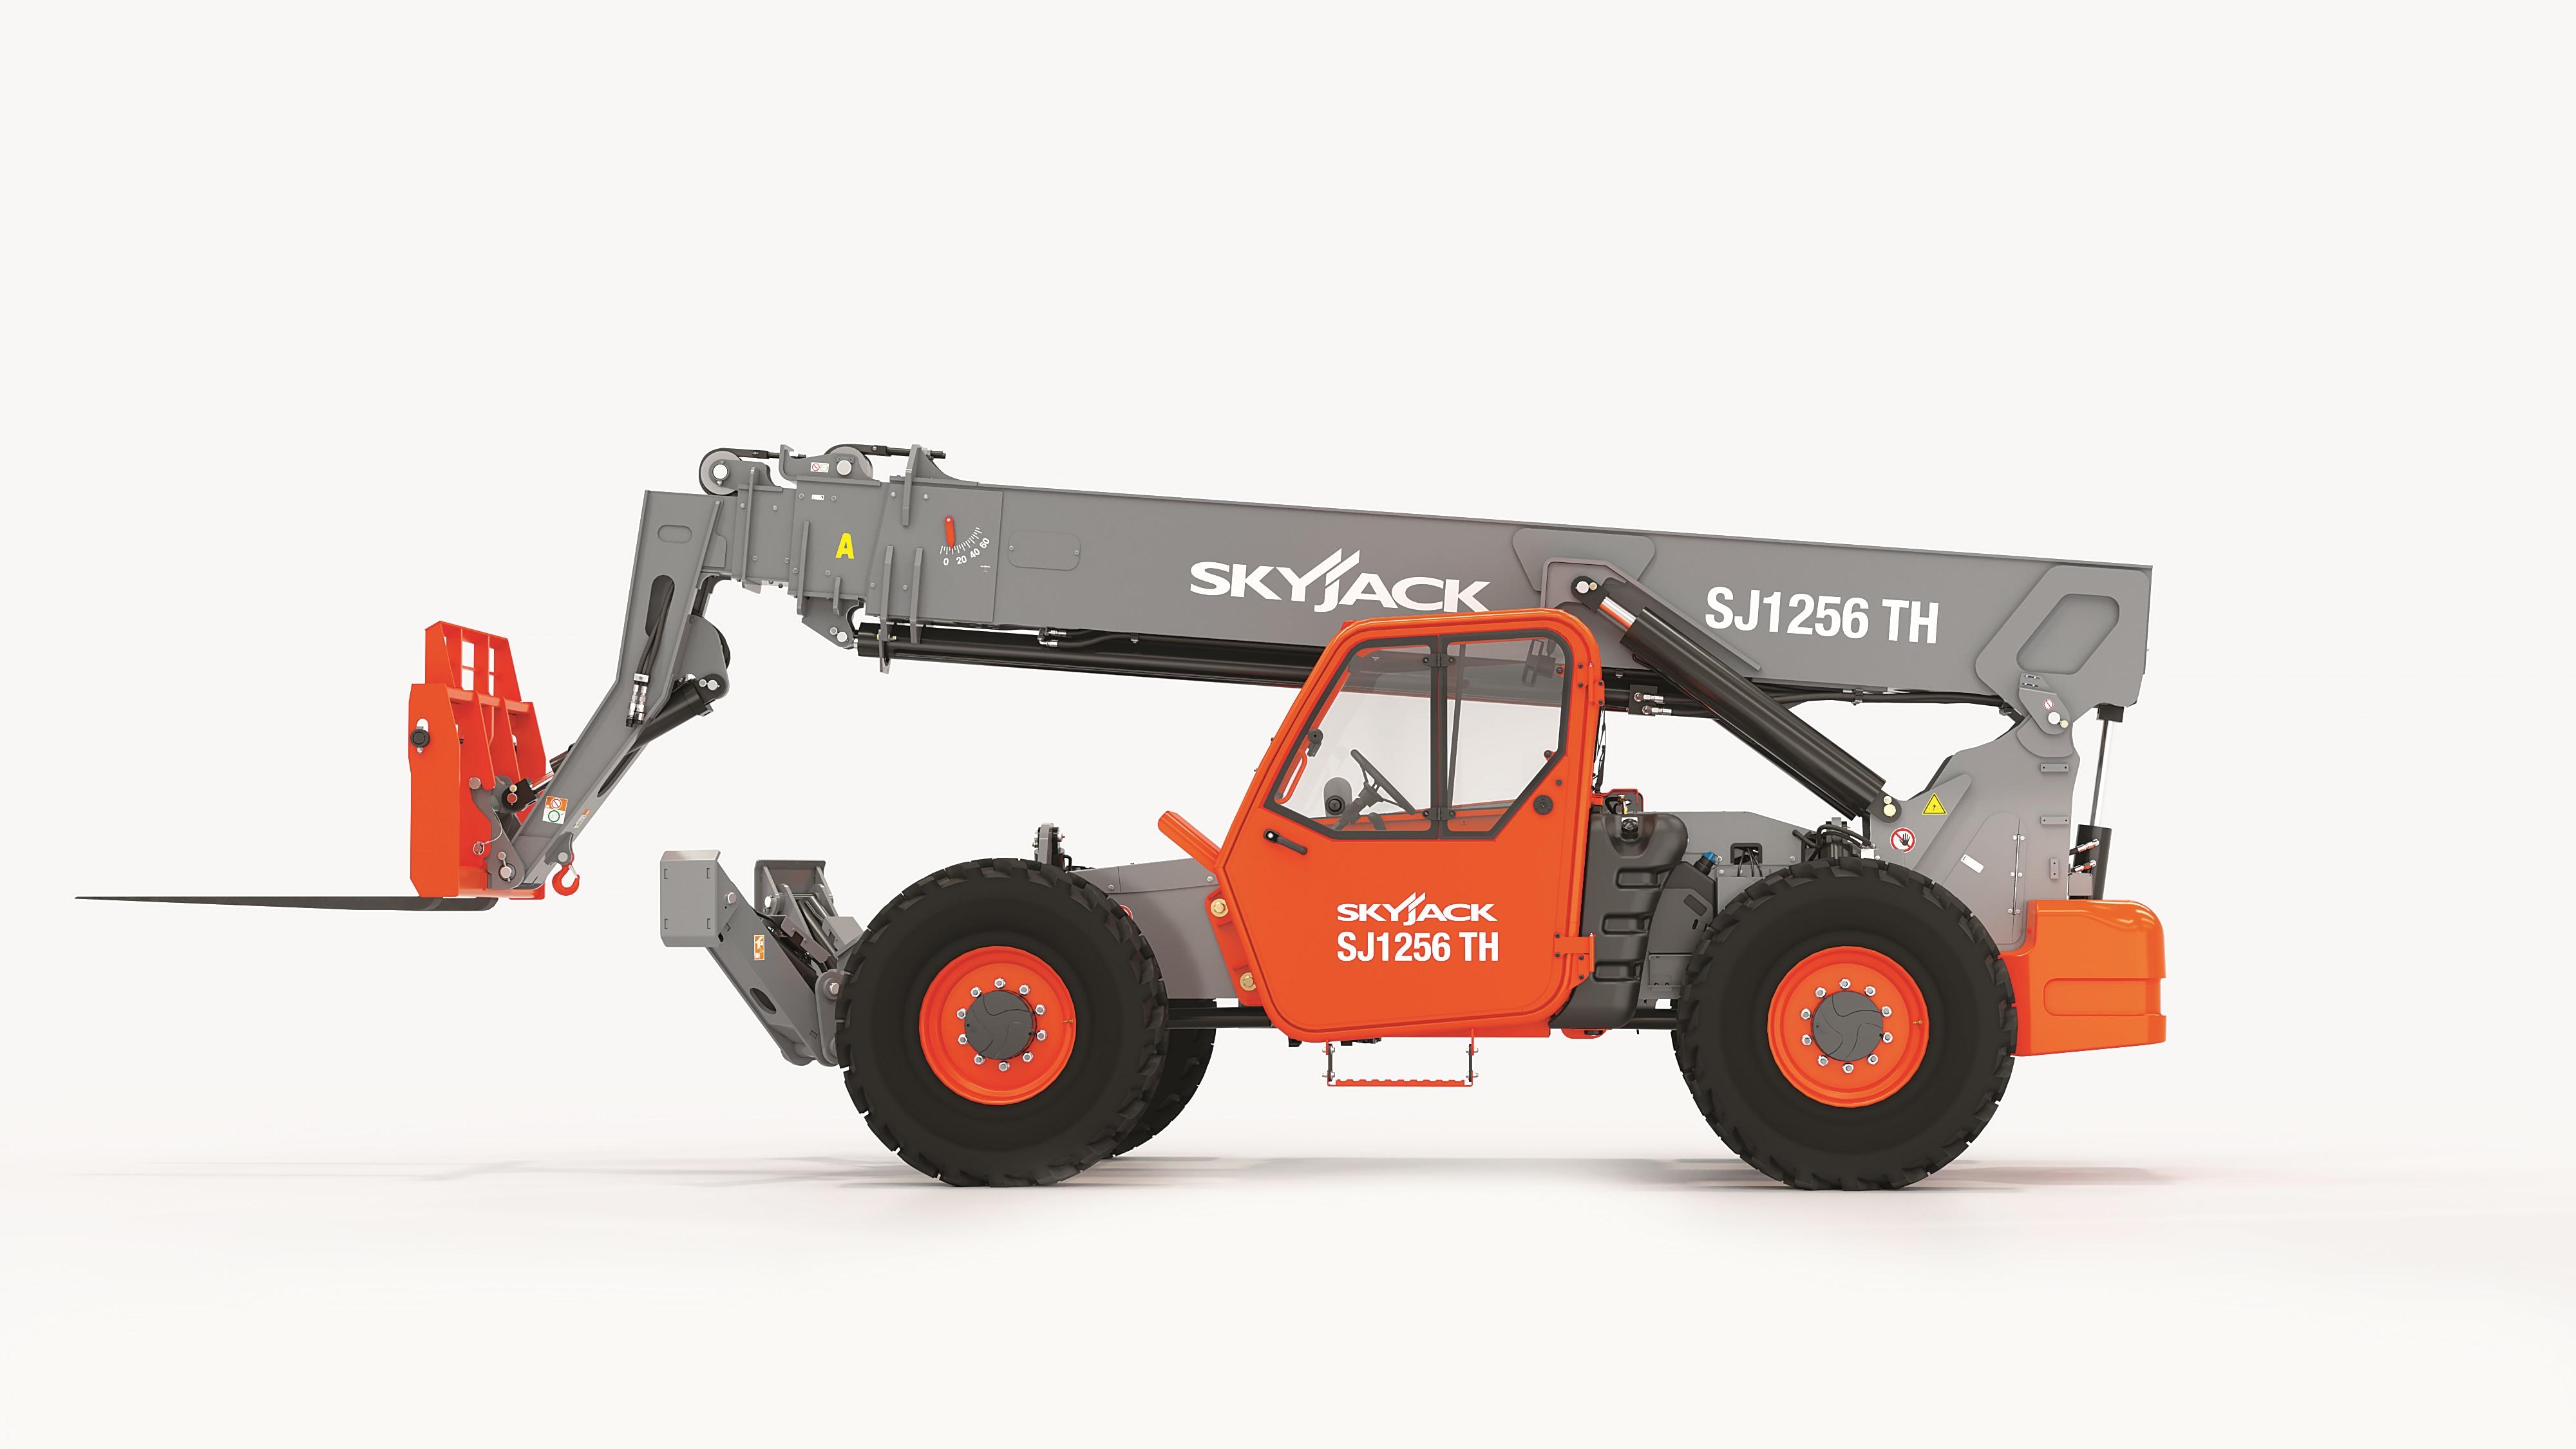 Skyjack SJ1256 TH